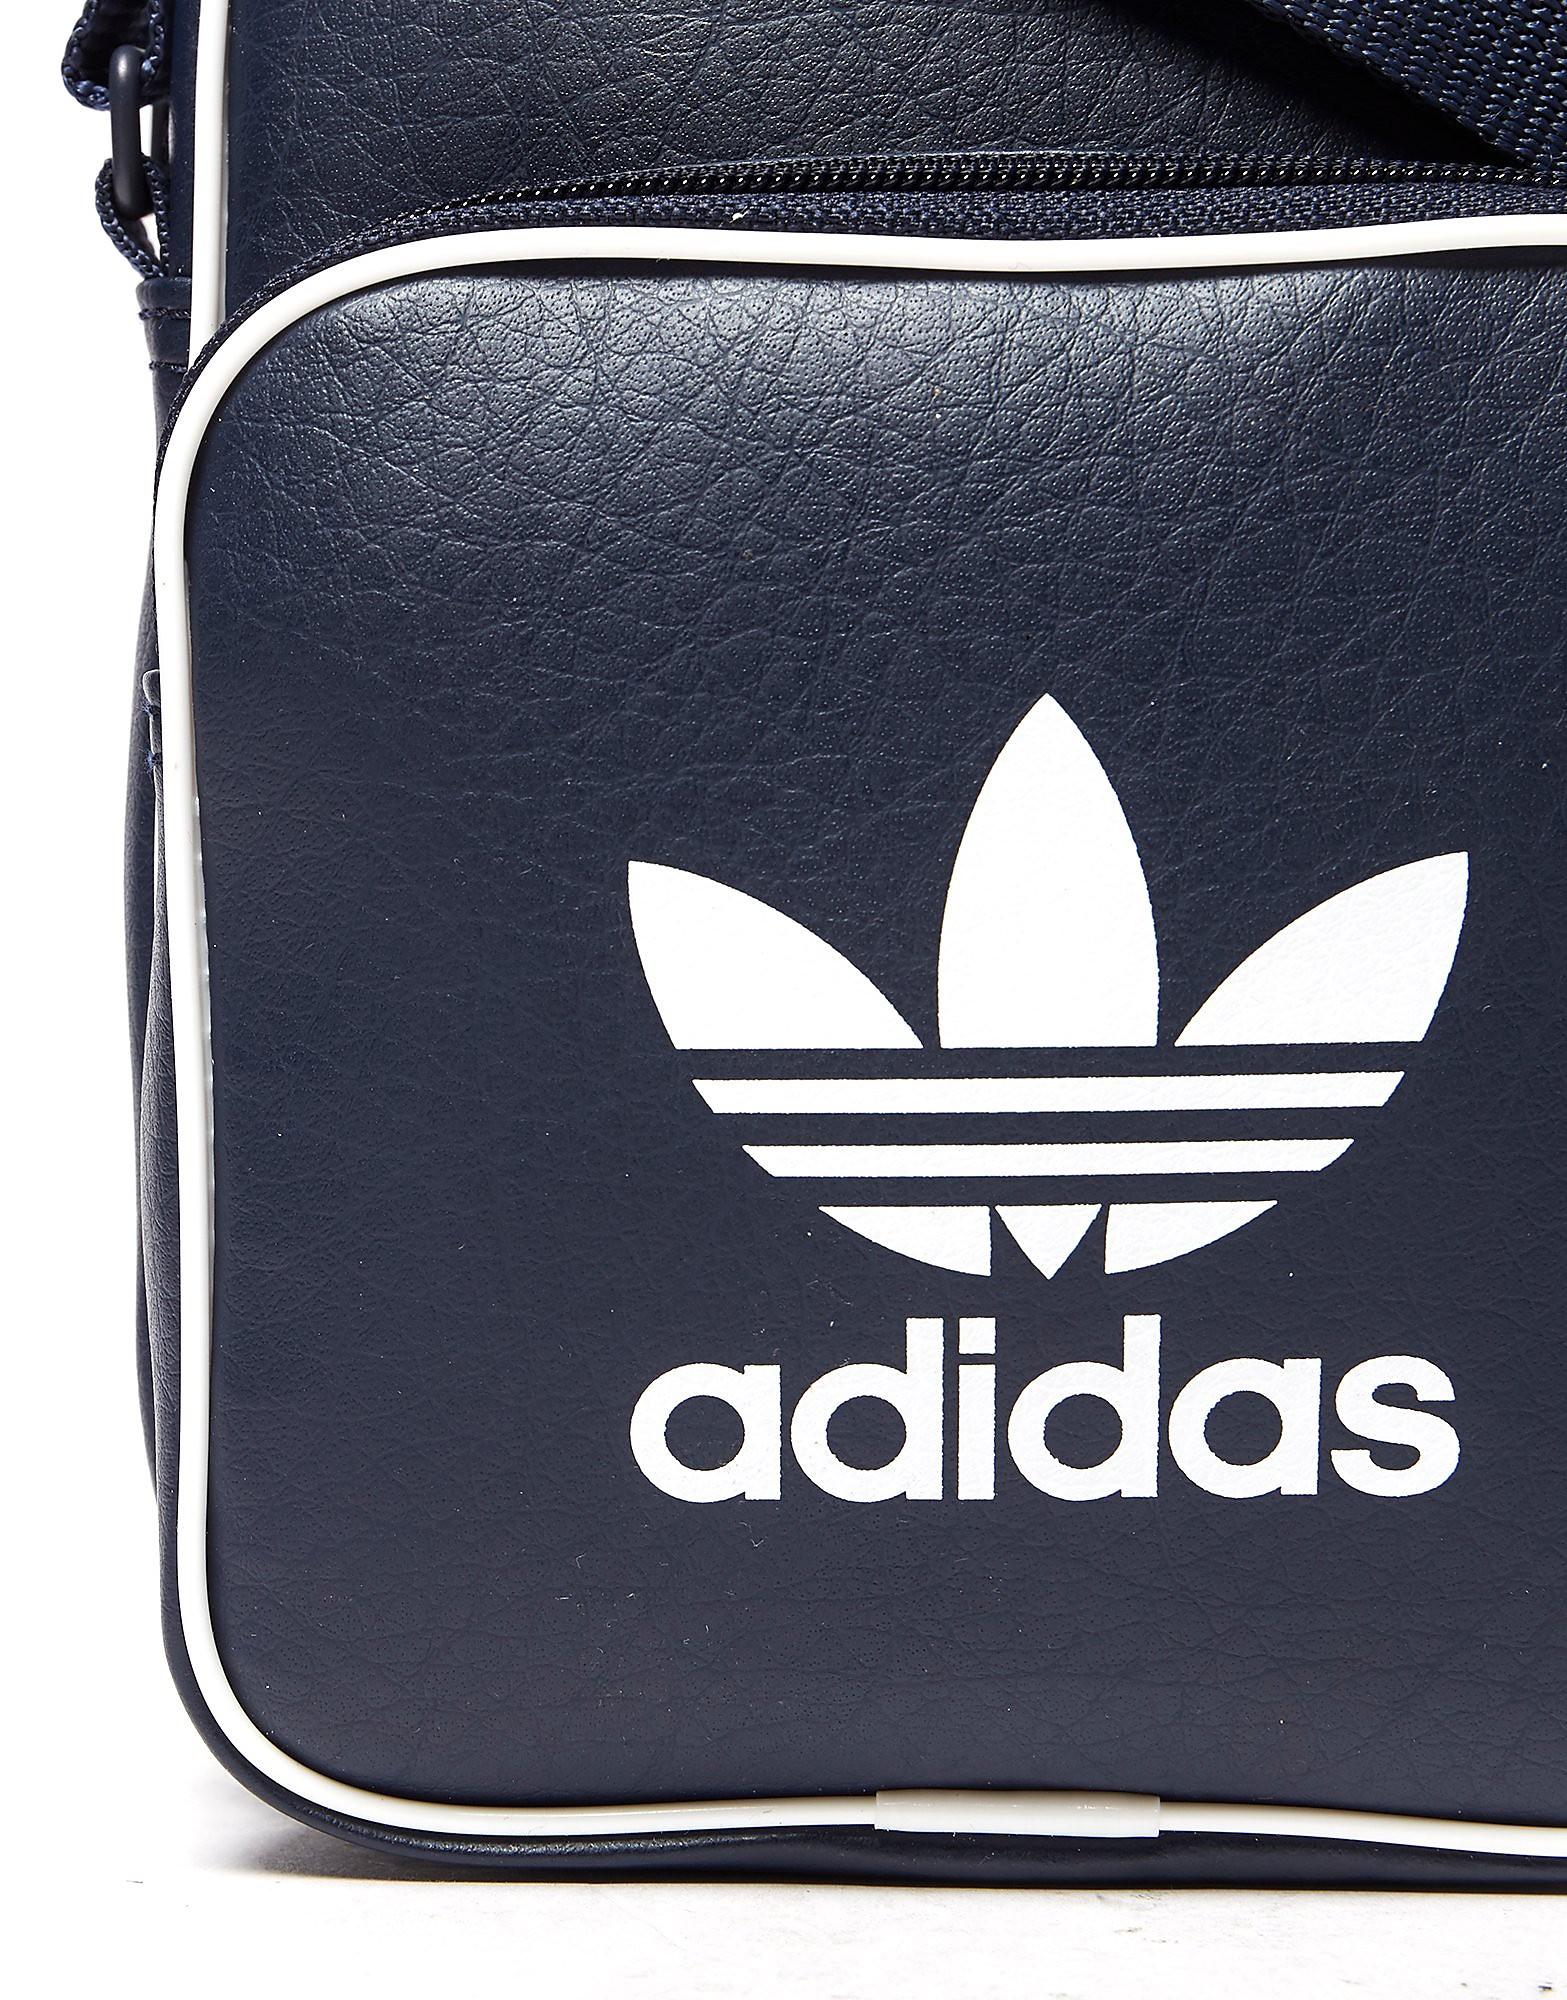 adidas Originals Classic Mini Bag